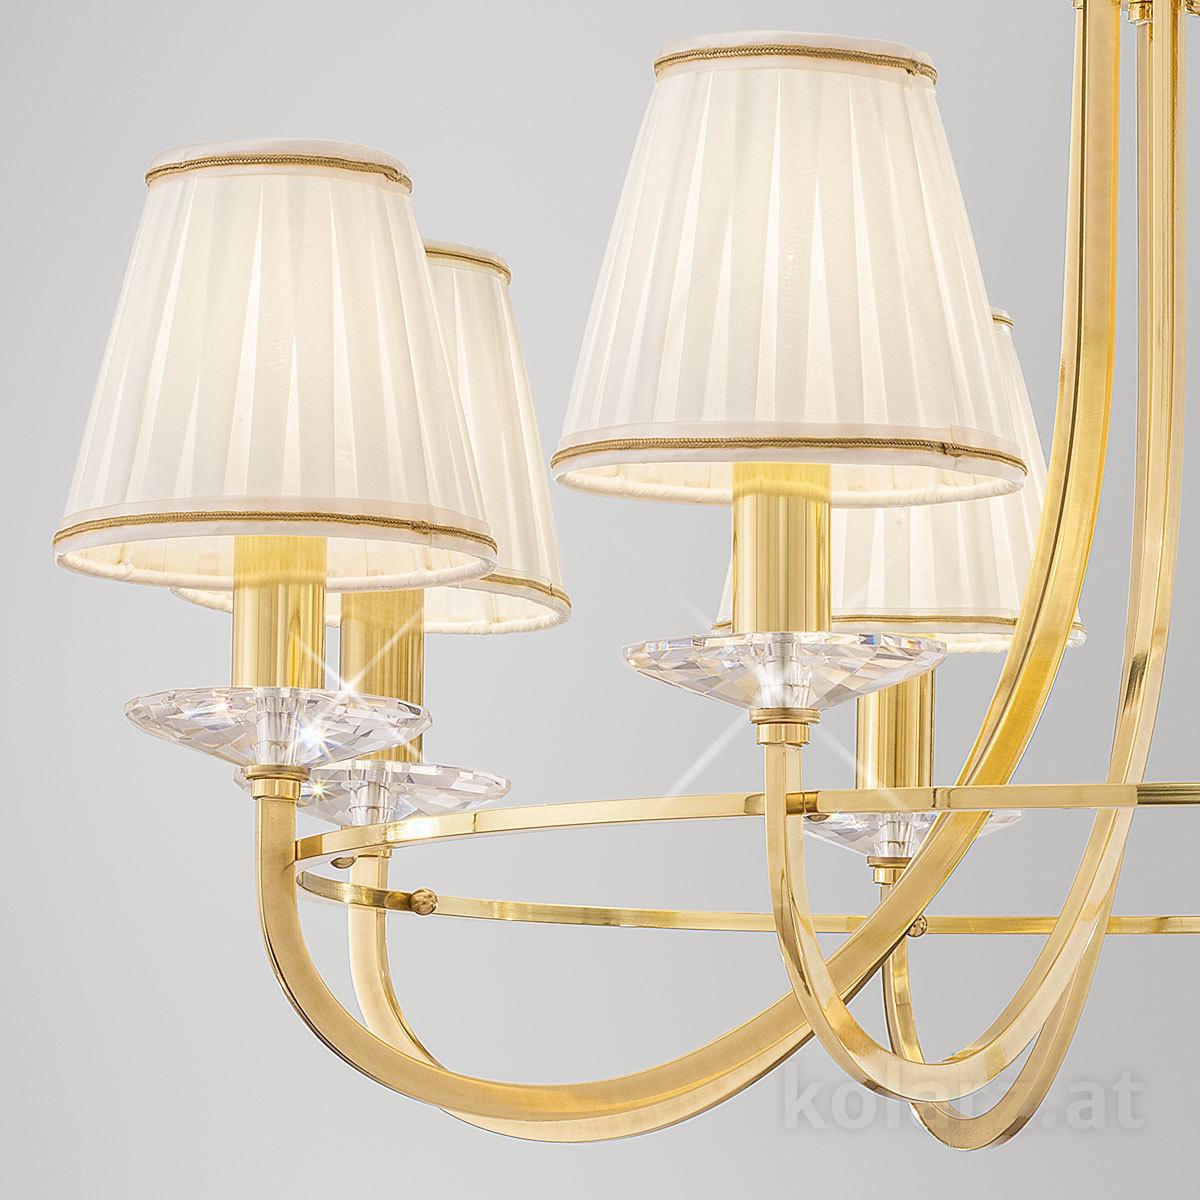 Chandelier Imperial Engl Brass 216 76 8 Lights Engl